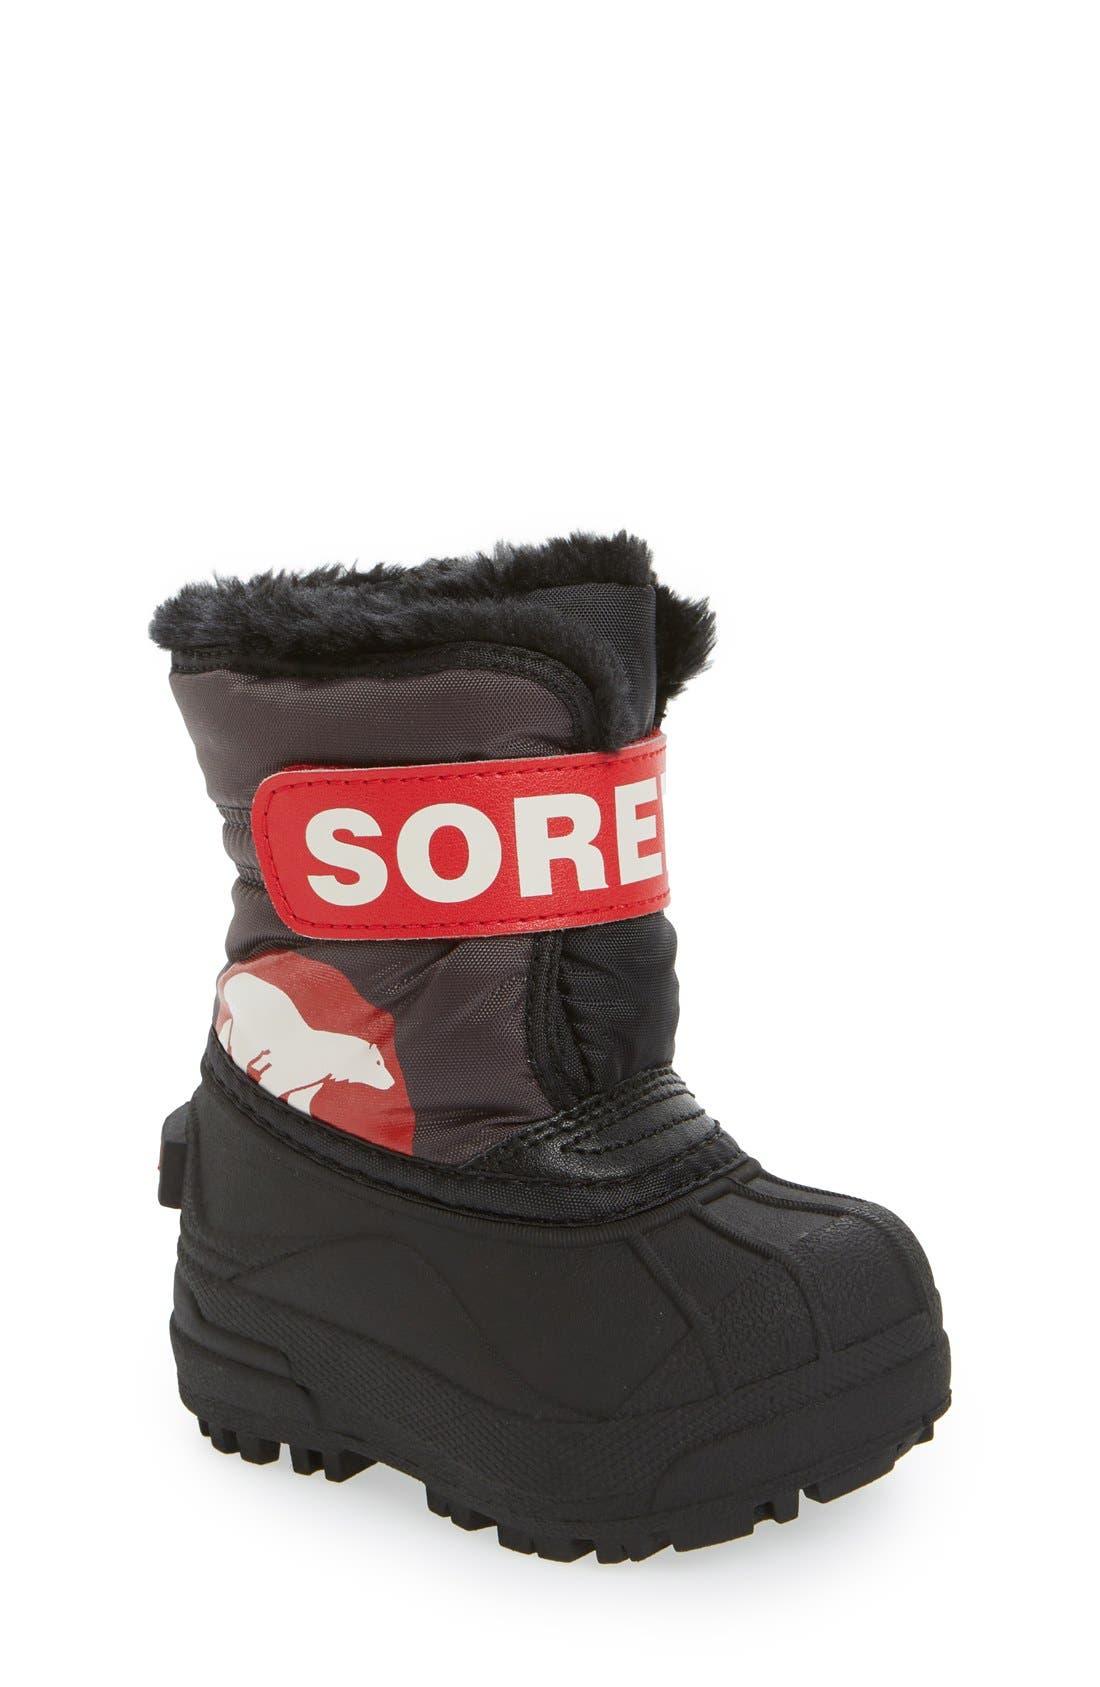 Alternate Image 1 Selected - SOREL 'Snow Commander' Boot (Baby, Walker, Toddler & Little Kid)